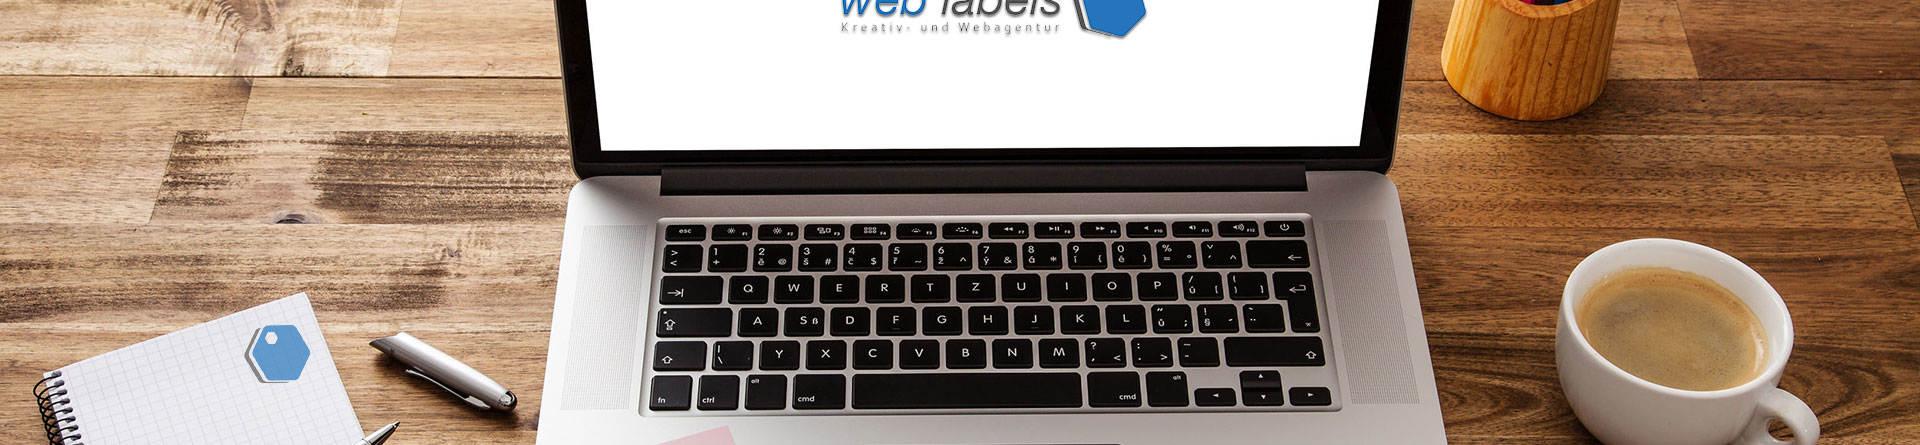 Shopware & Web-Agentur Hamburg / Lübeck - Web Labels